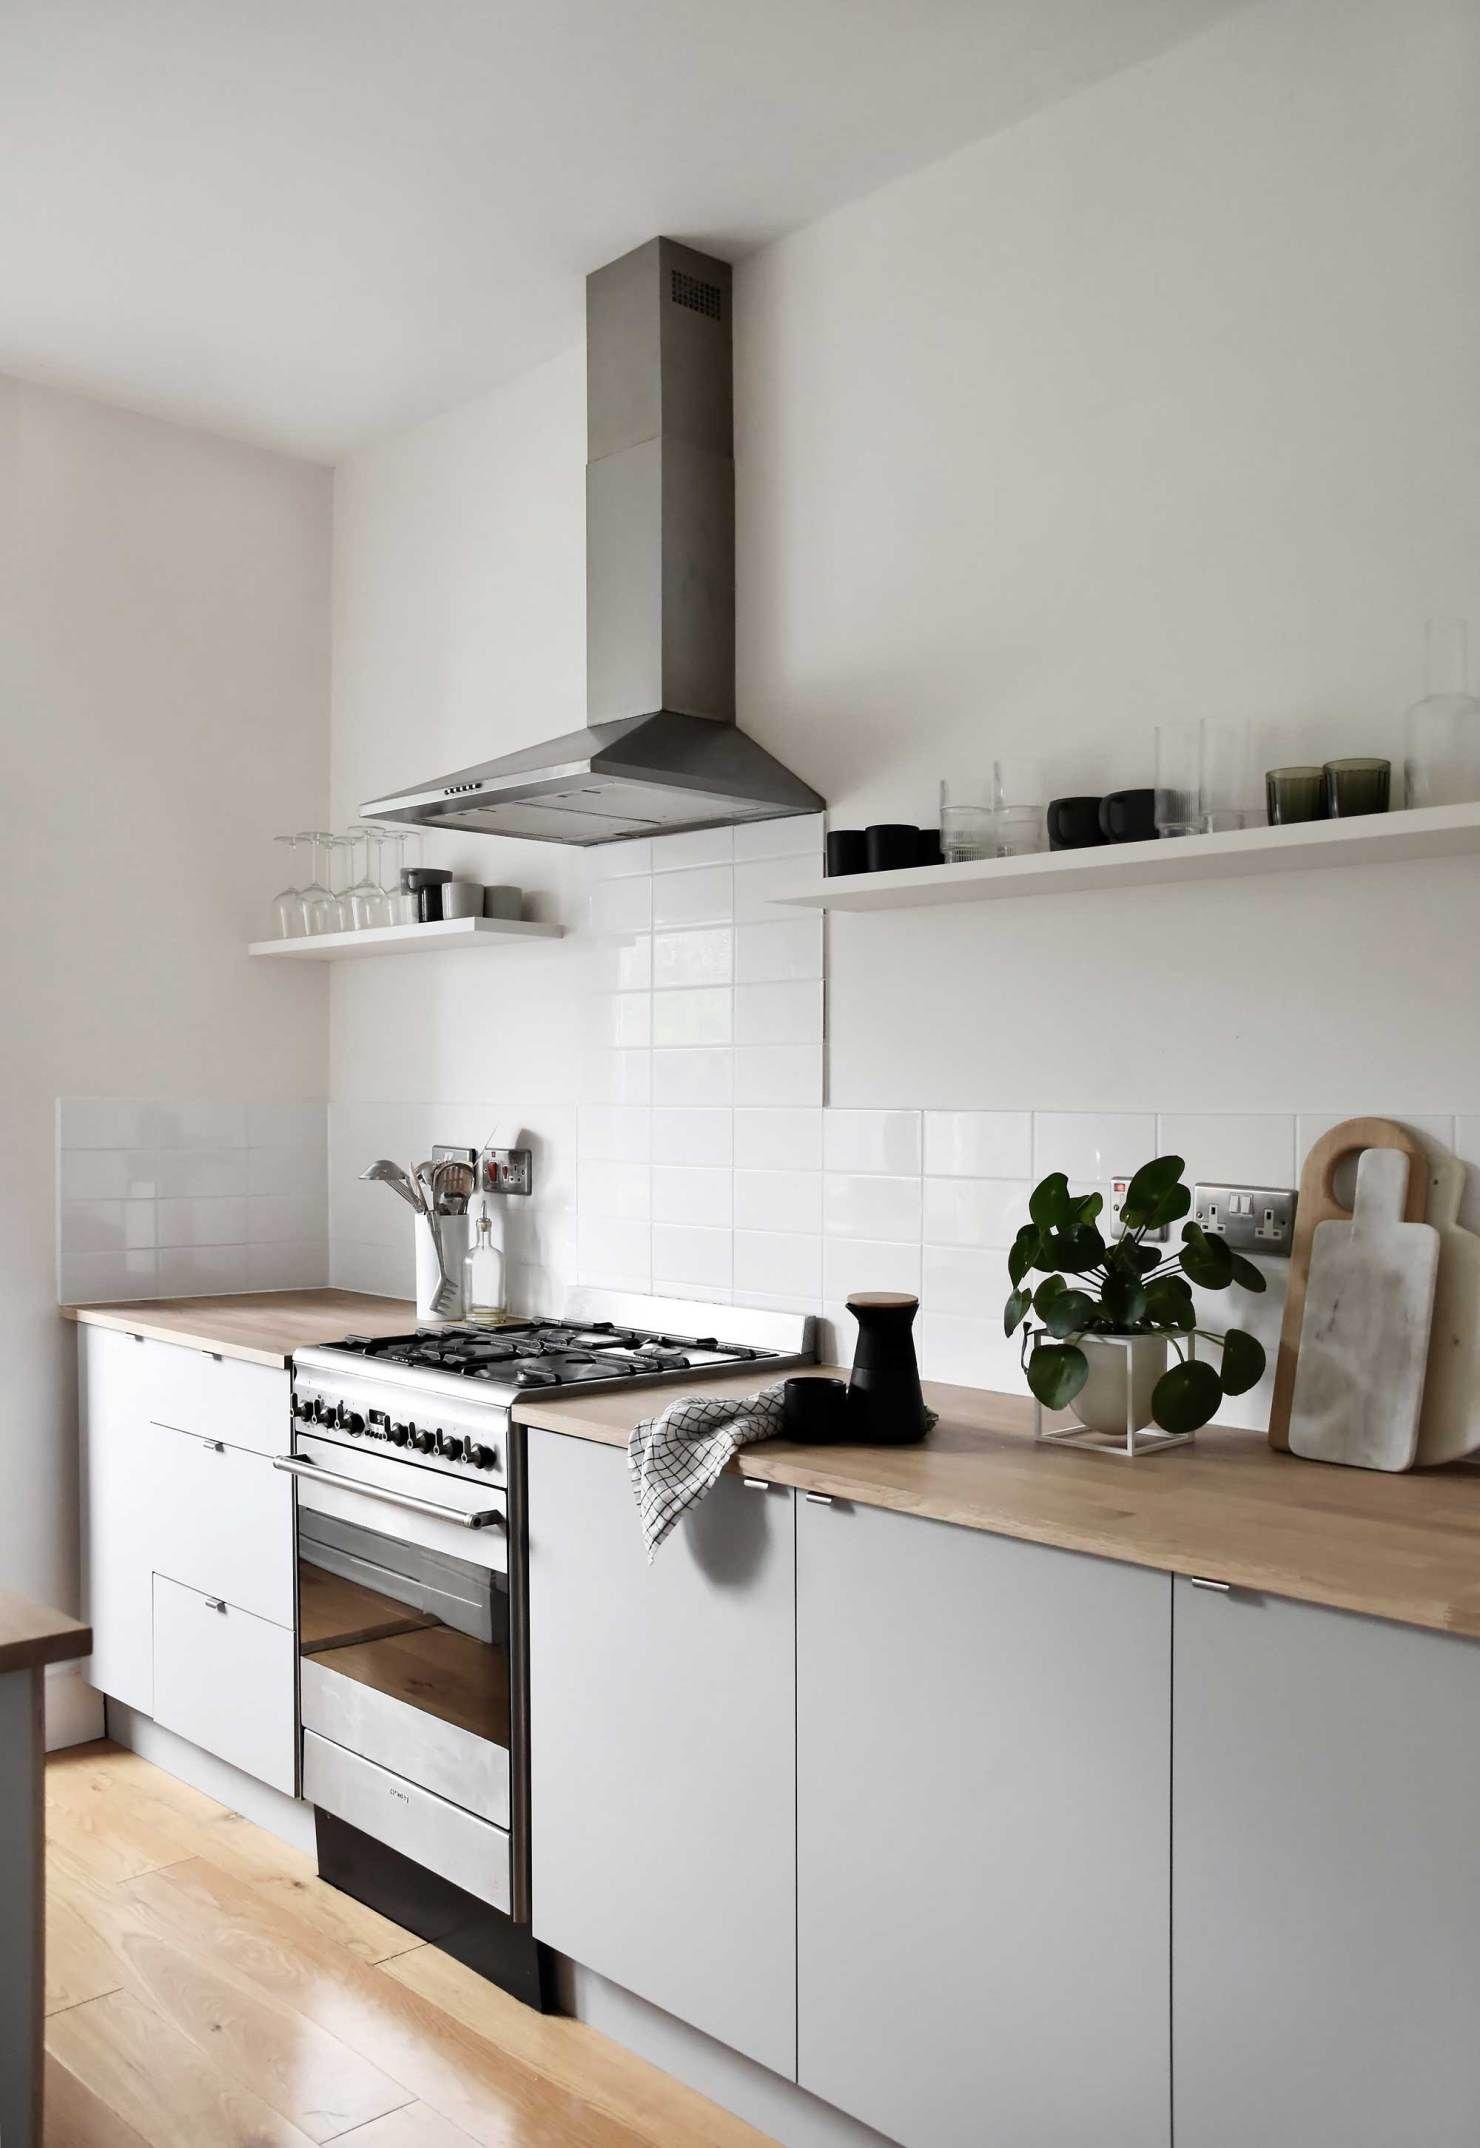 A minimalist kitchen makeover on a budget